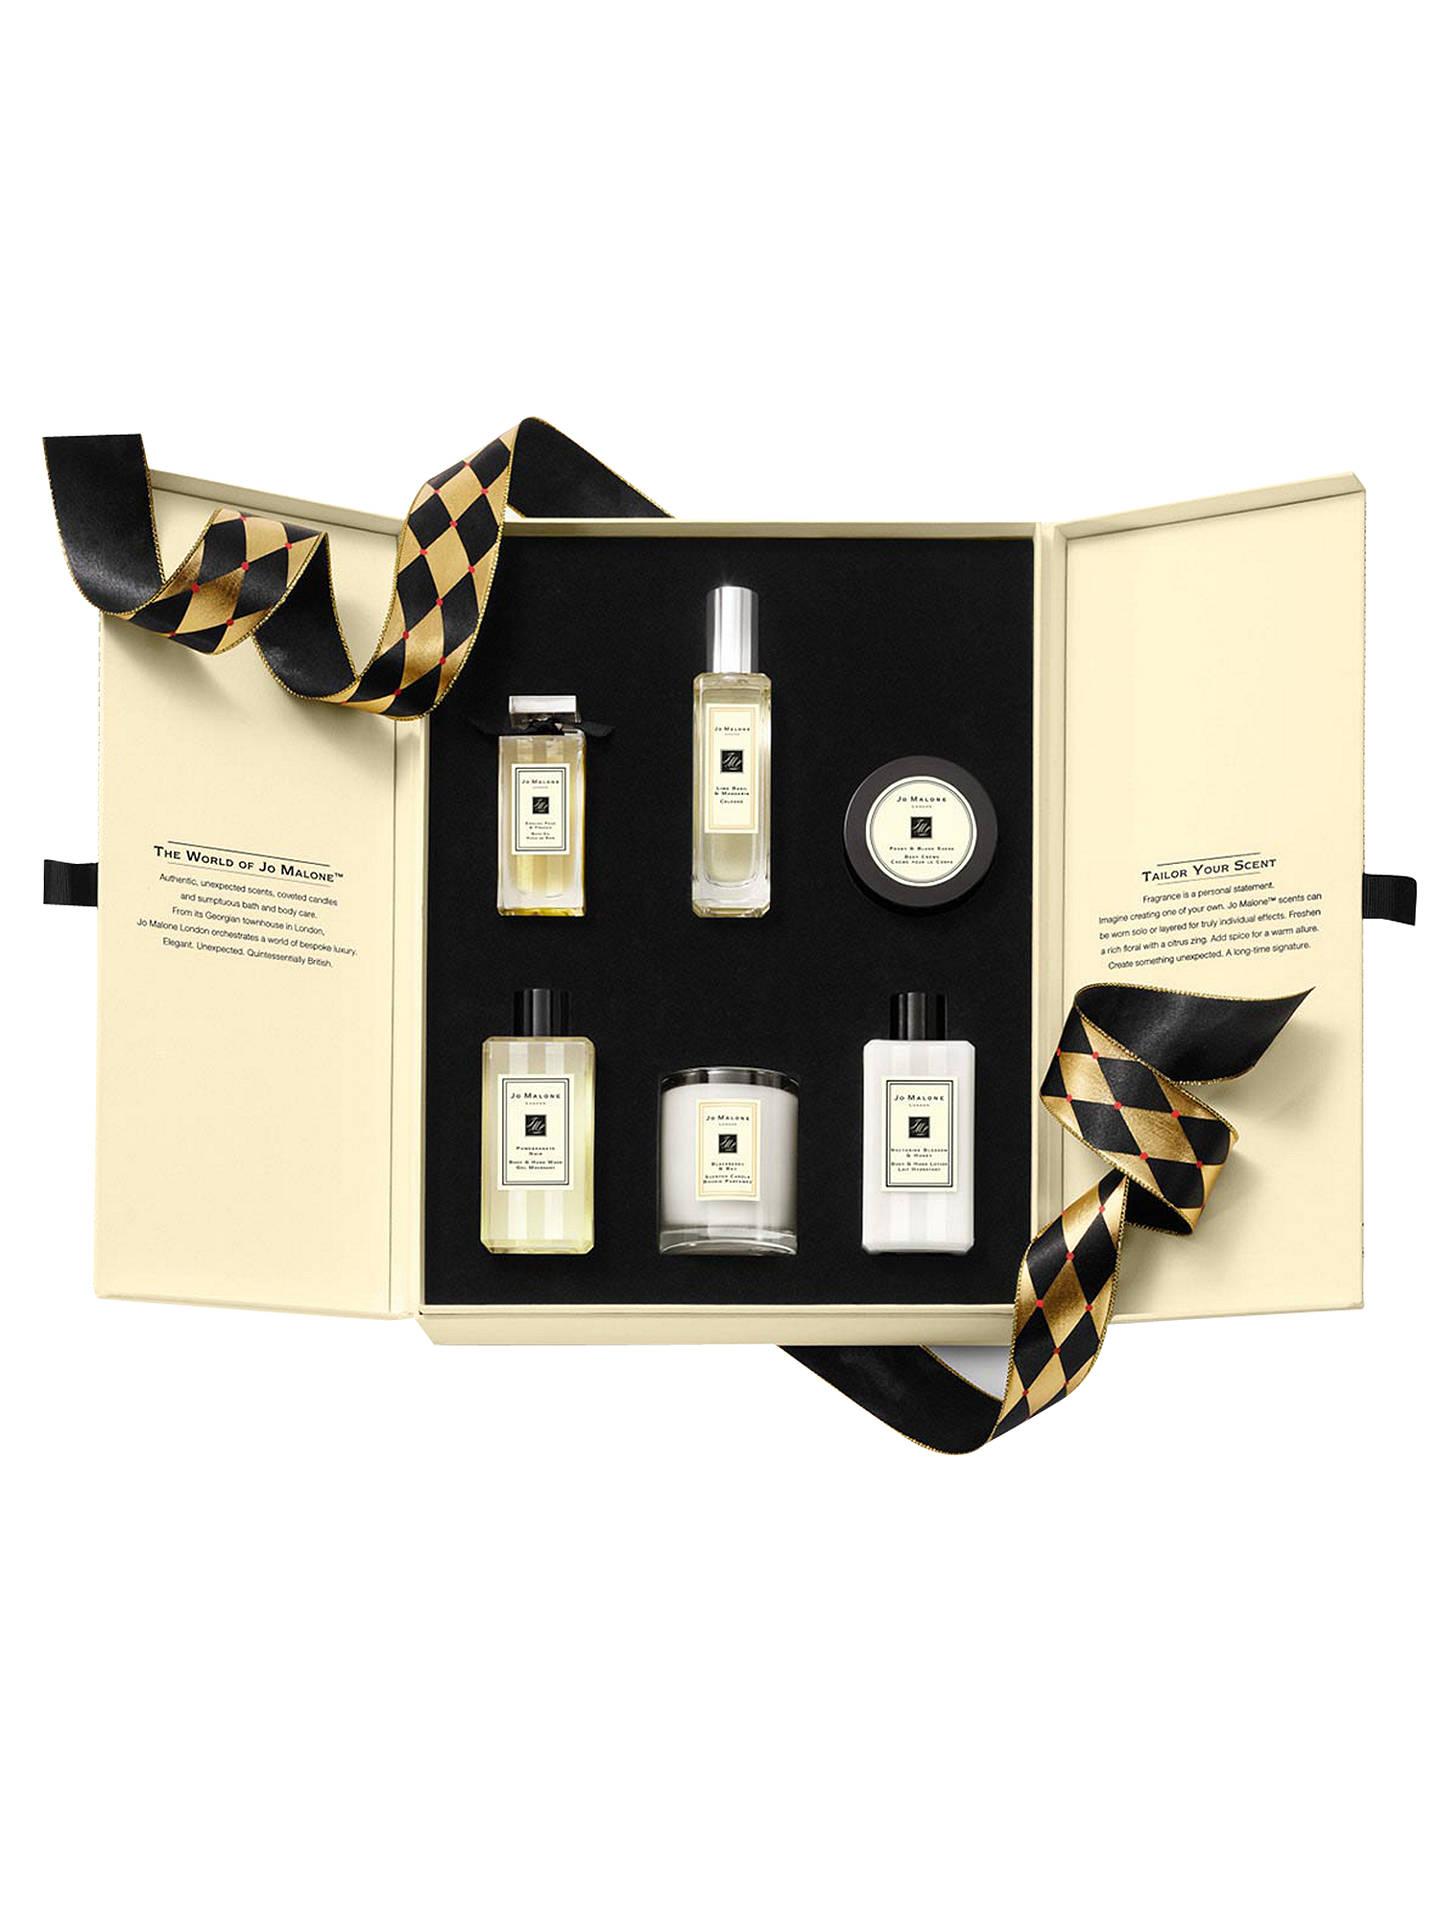 jo malone london house of jo malone fragrance gift set at. Black Bedroom Furniture Sets. Home Design Ideas